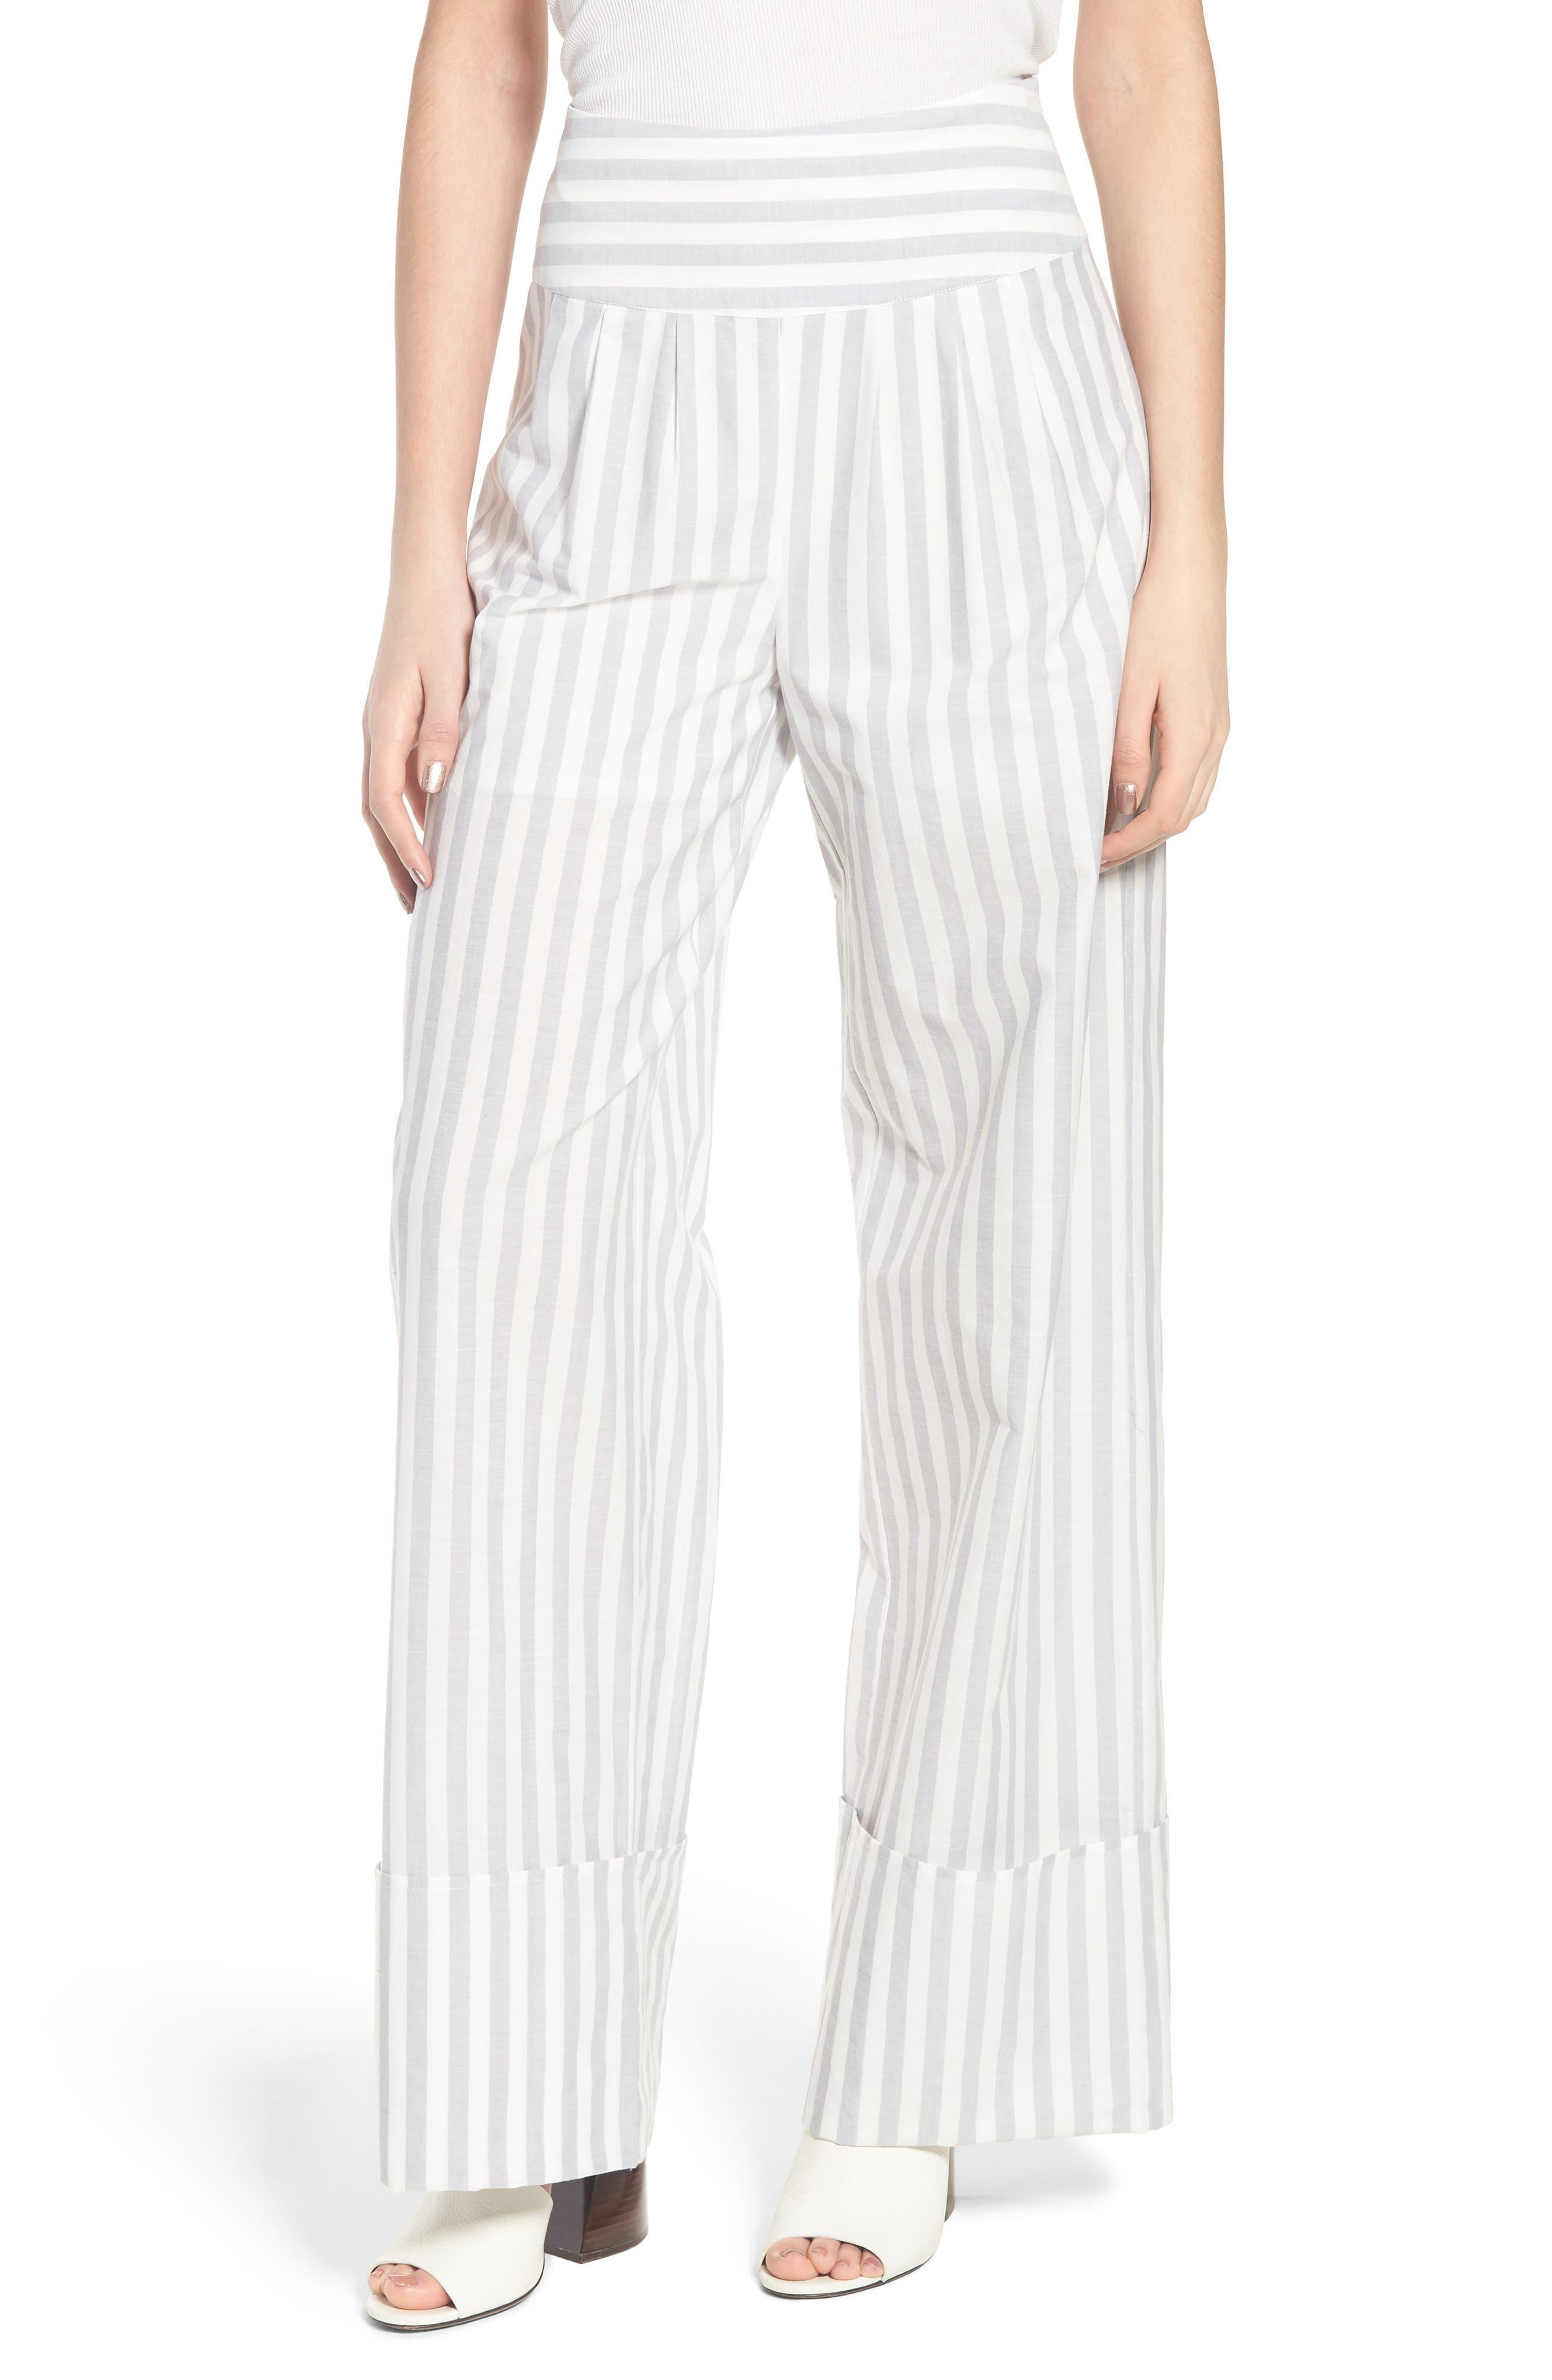 LOST INK Wide Turn Up Stripe Trouser